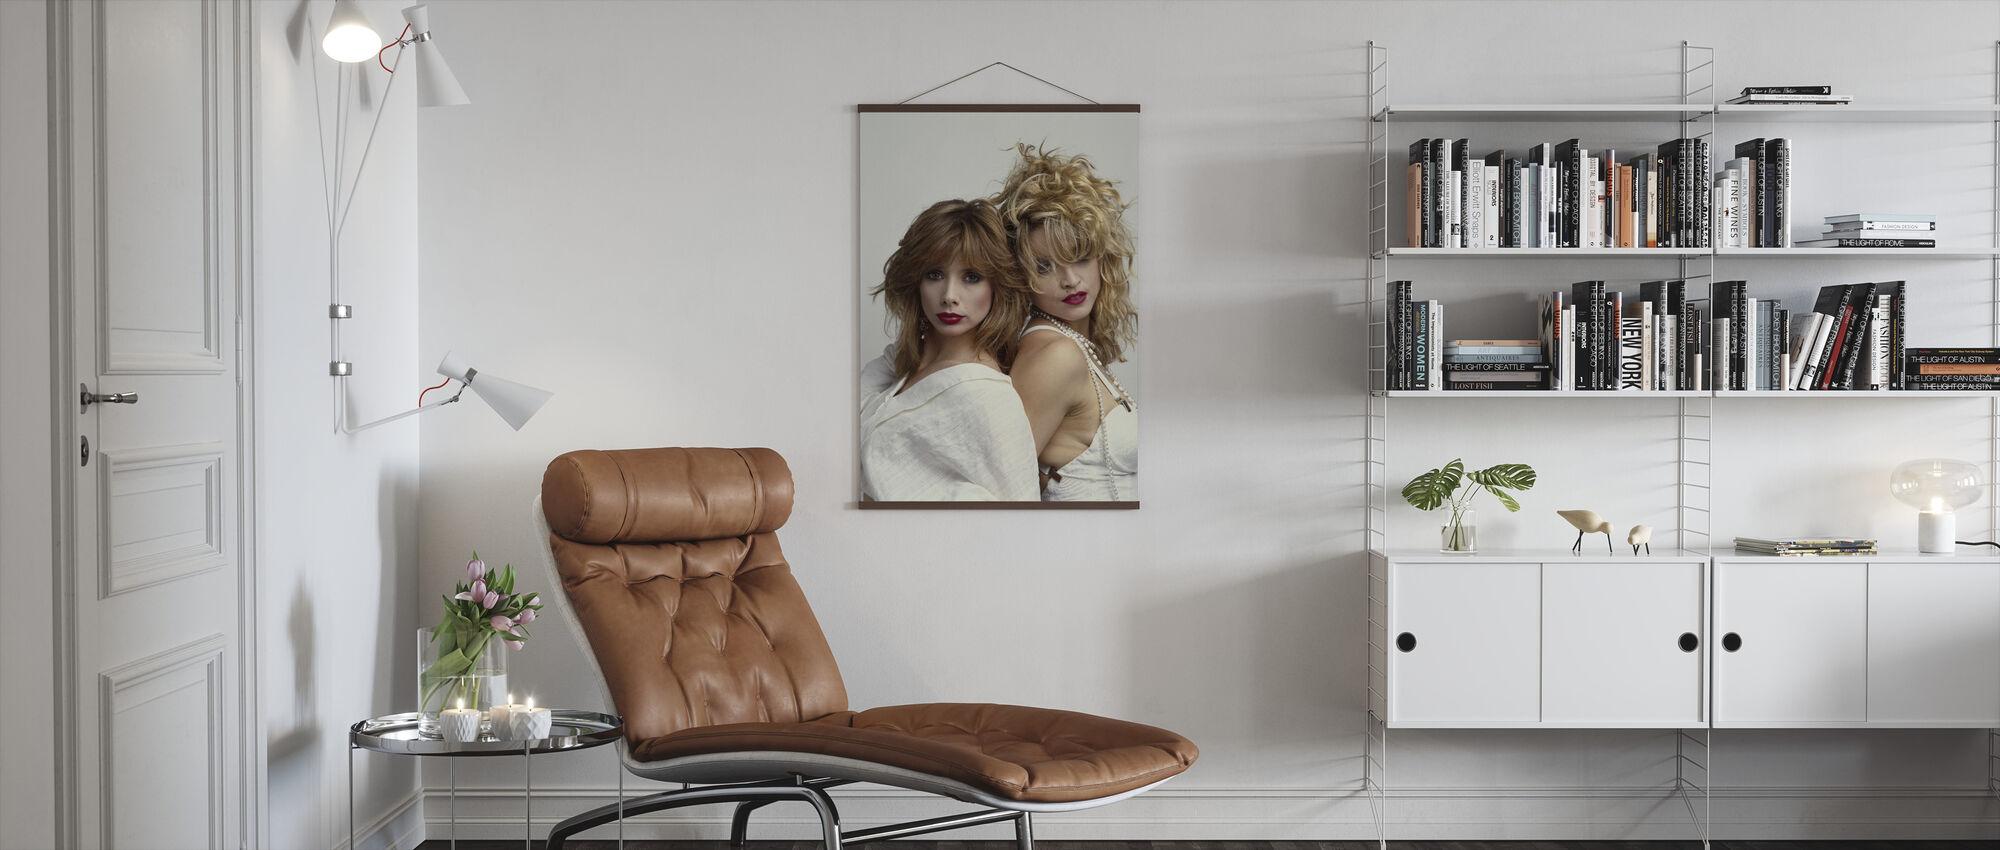 Desperately Seeking Susan - Madonna - Poster - Living Room